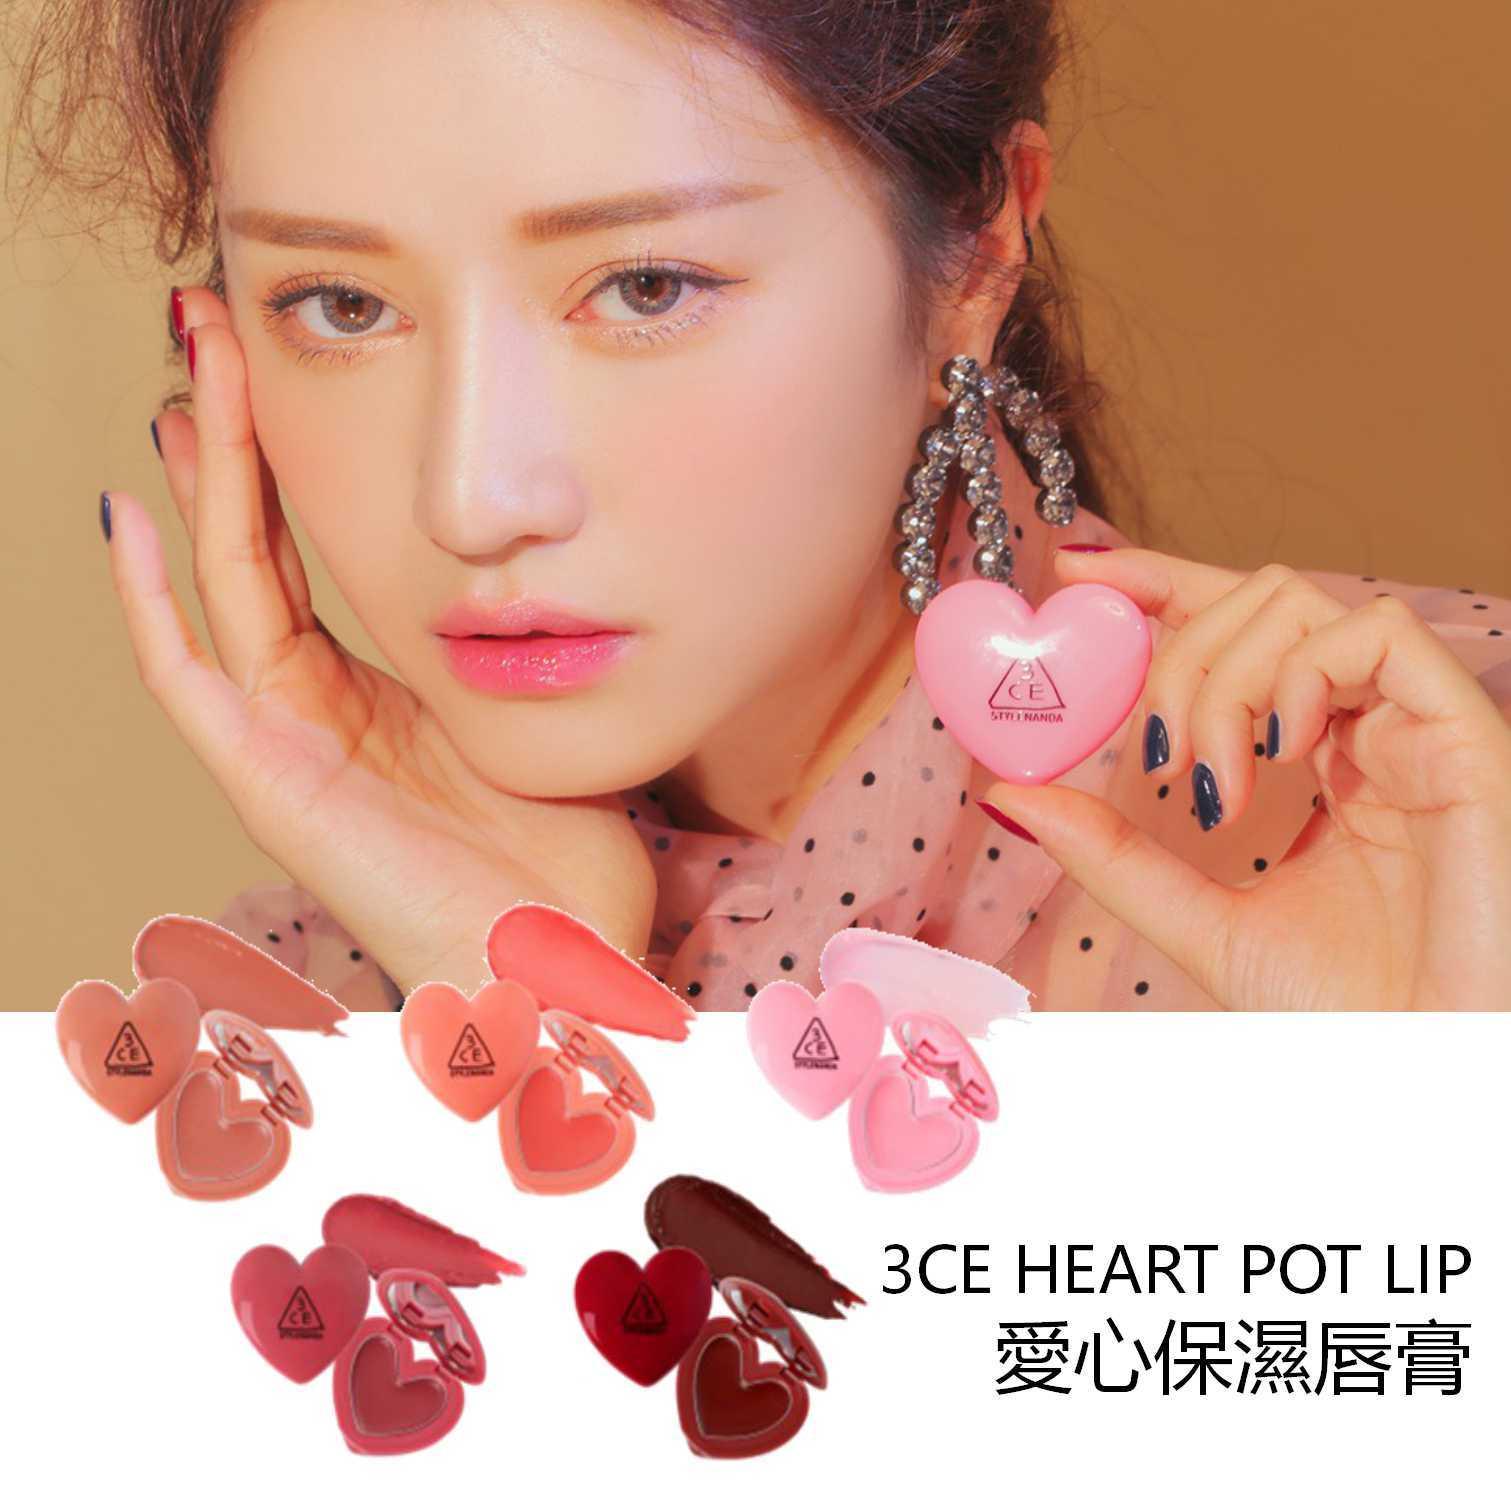 3CE HEART POT LIP 愛心唇膏 保濕 水潤 唇膏 3ce《 韓妍秀100%韓國空運》